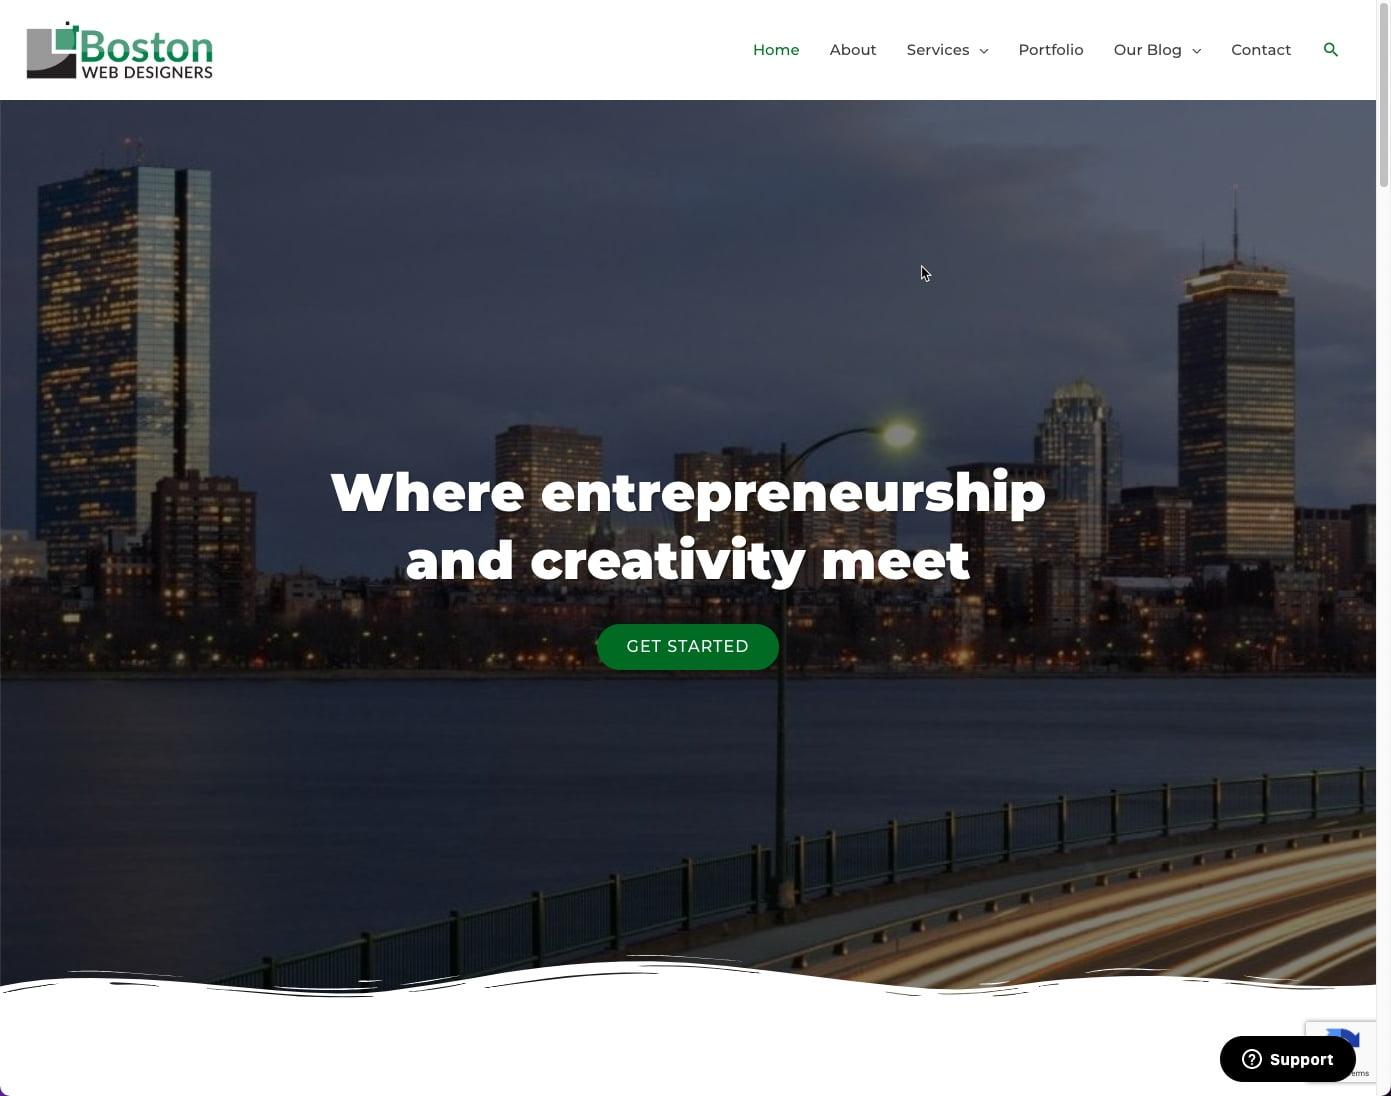 Boston Web Designers